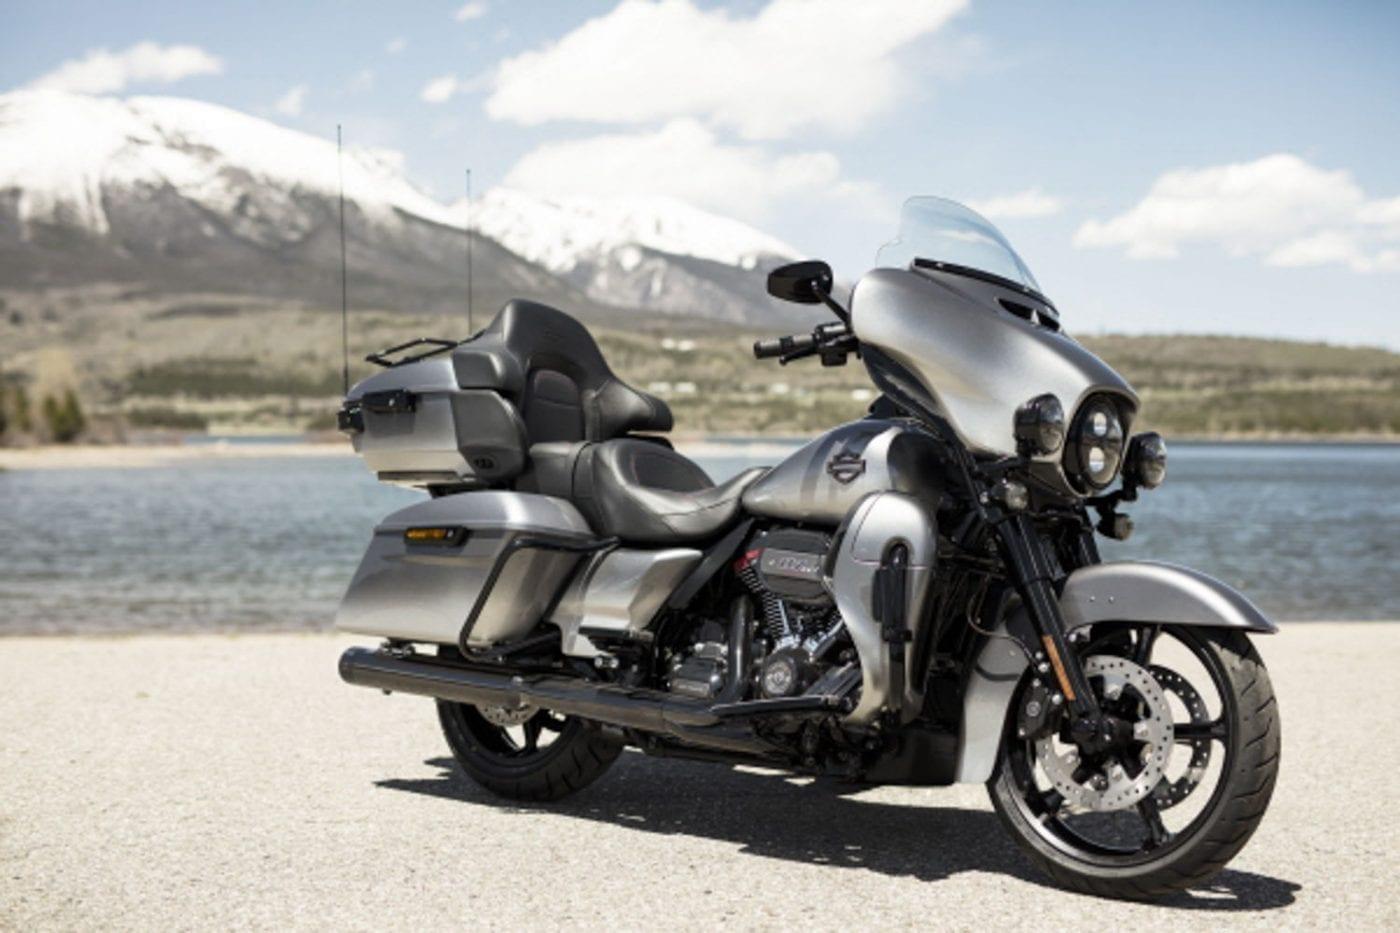 Harley Davidson Ultra Limited CVO 2019